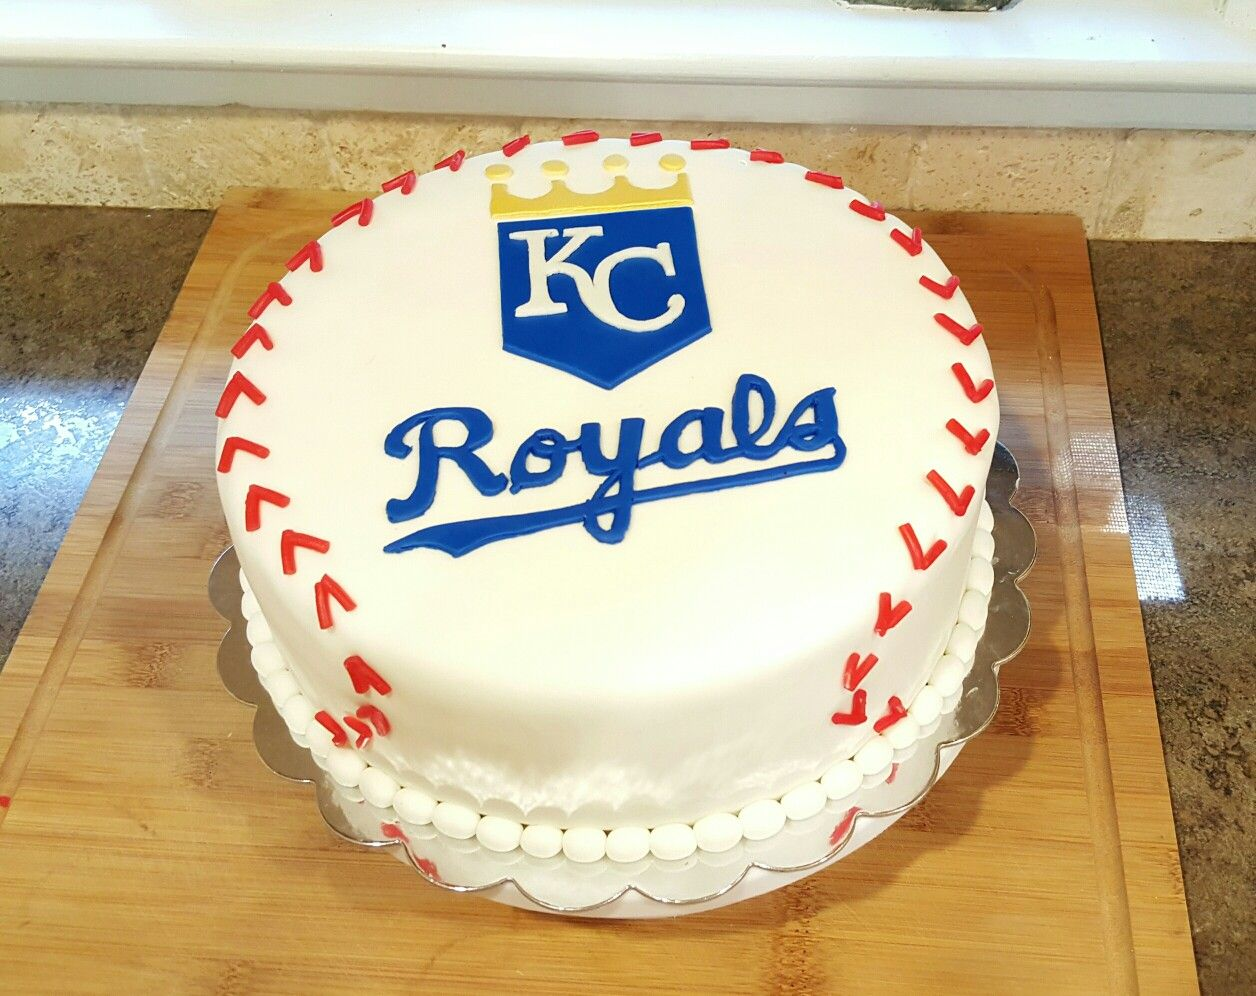 Phenomenal Kansas City Royals Fondant Cake Baseball Birthday Cakes Cake Funny Birthday Cards Online Elaedamsfinfo